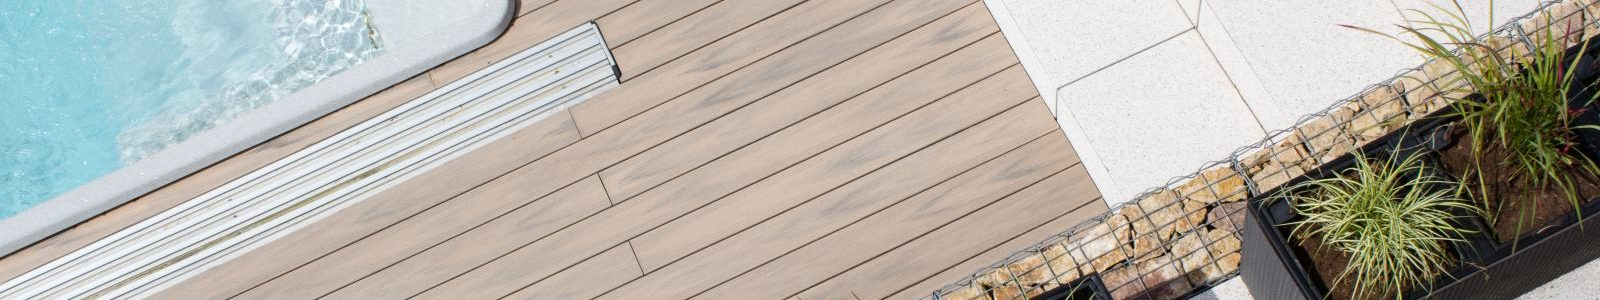 woodplastic-terasy-forest-plus-teak-6